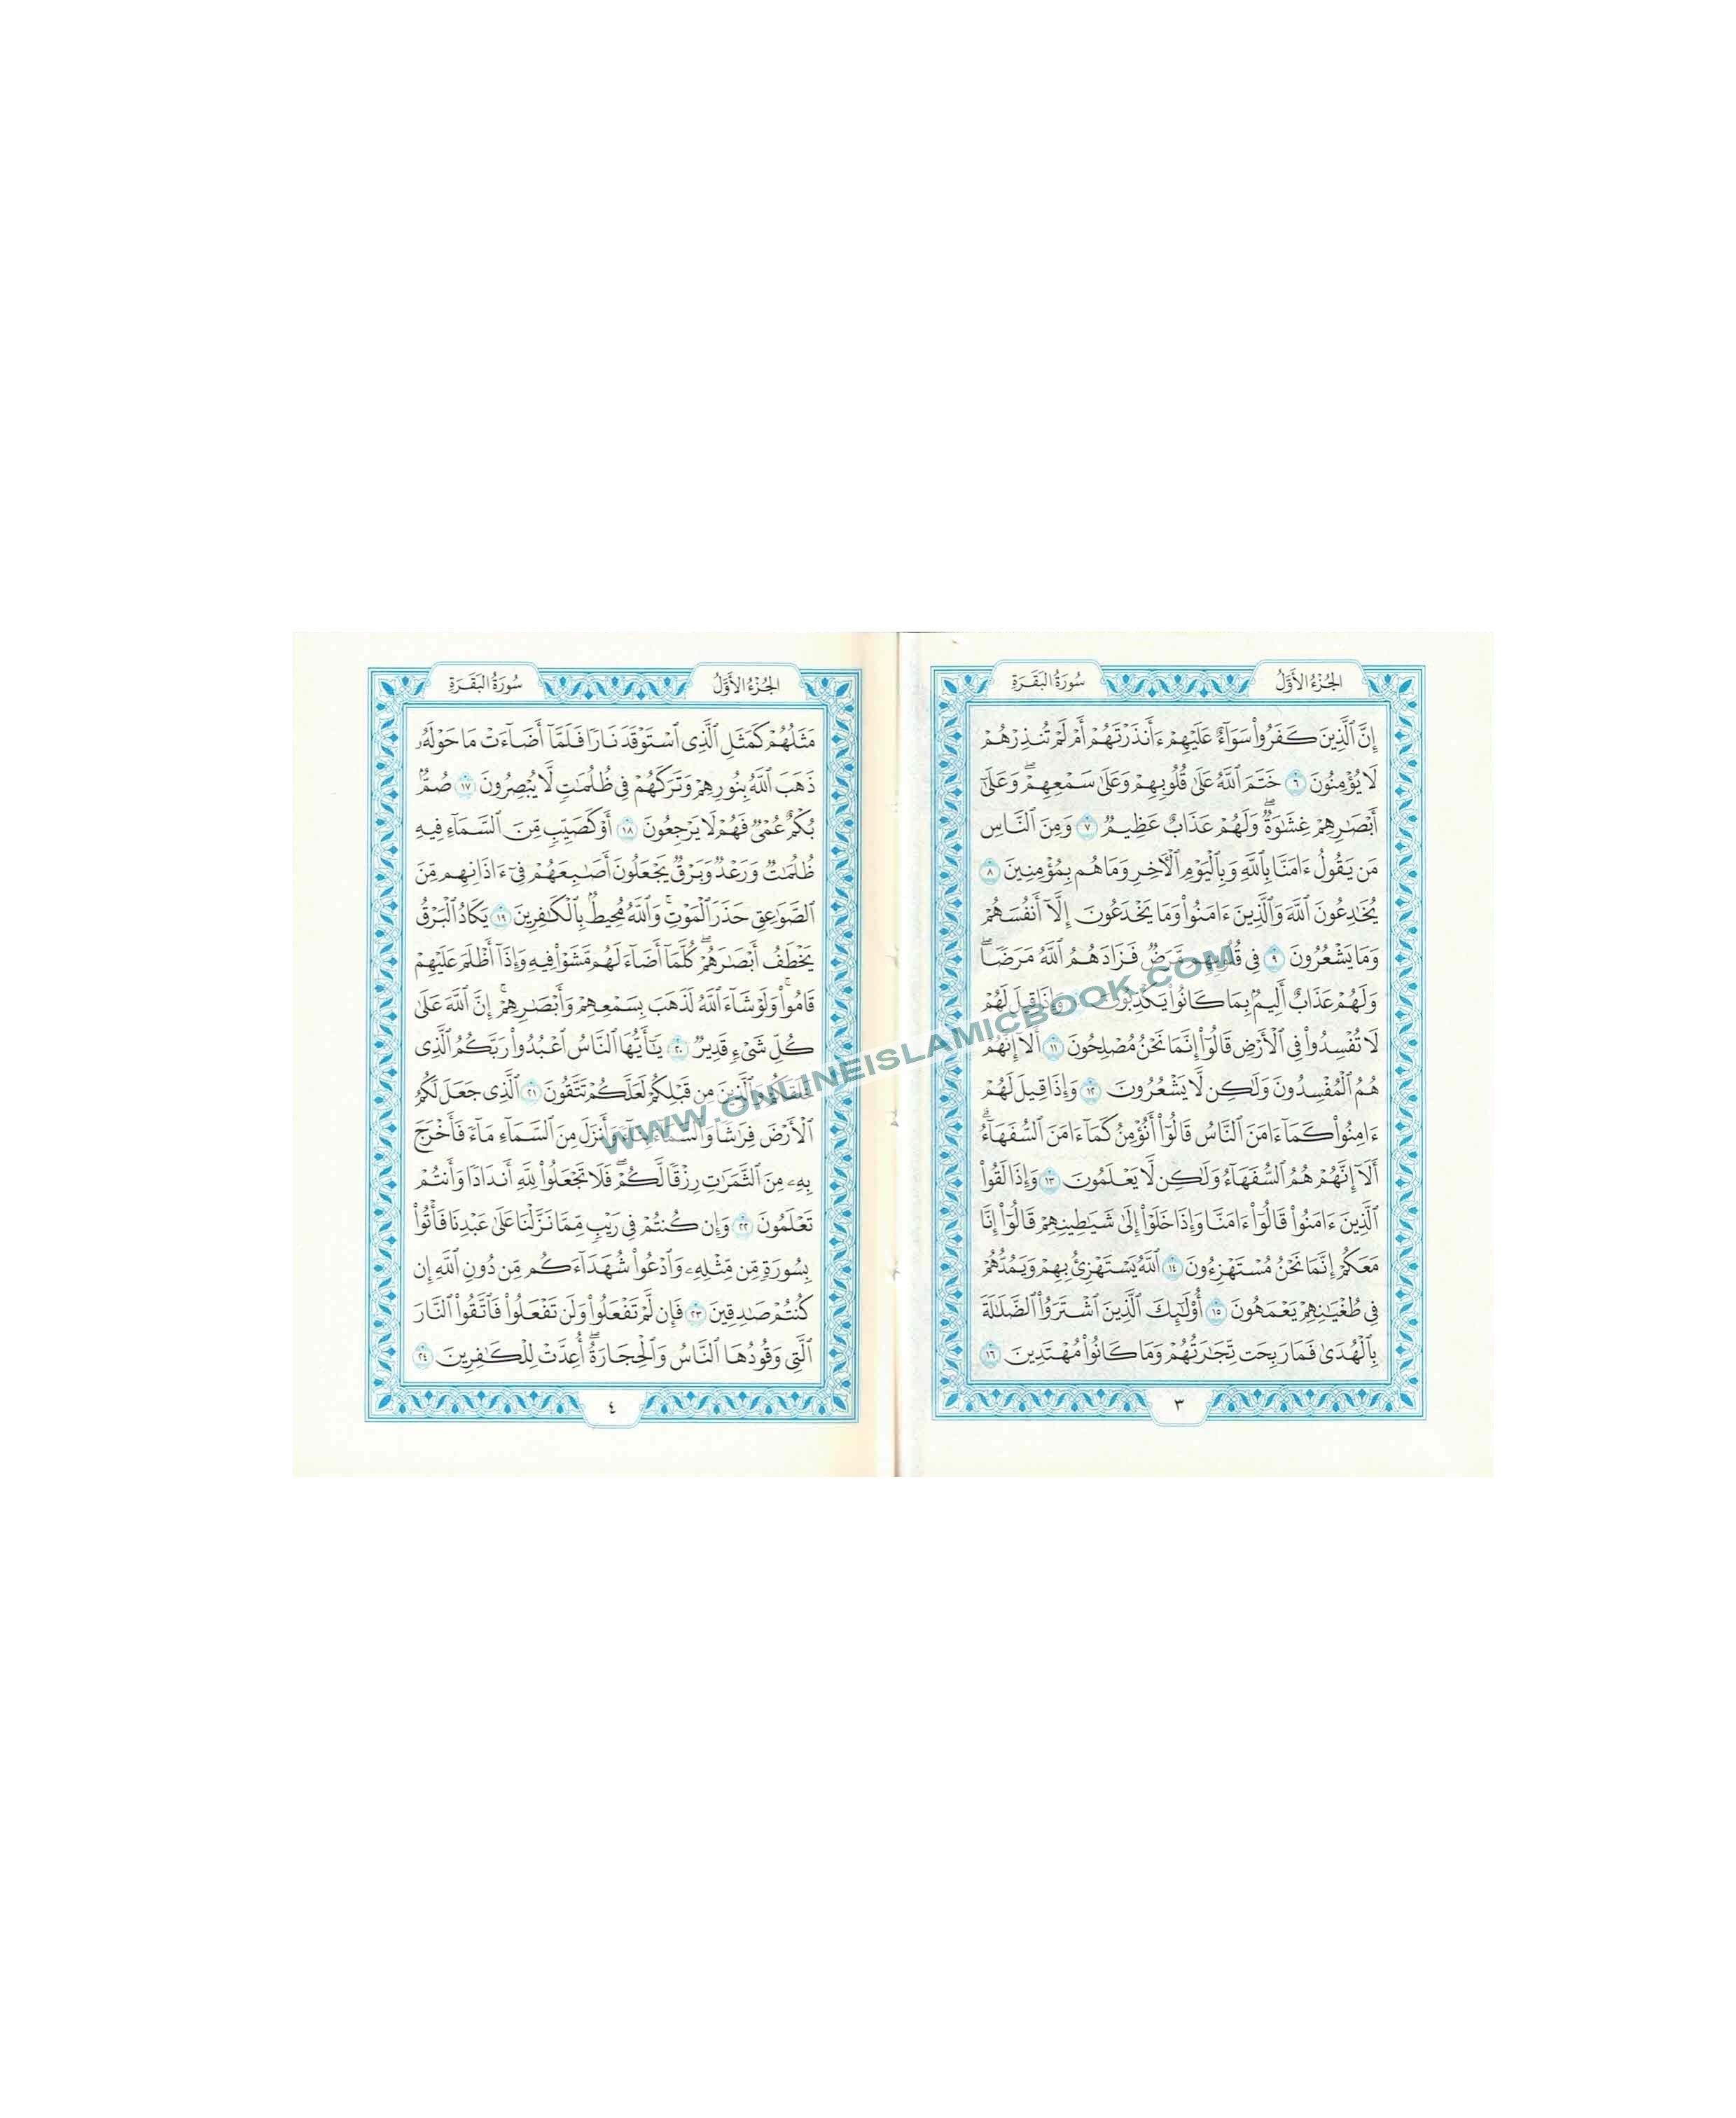 mushaf-madinah-al-quran-al-kareem-cream-paper-pocket-size-uthmani-script-5-.jpg